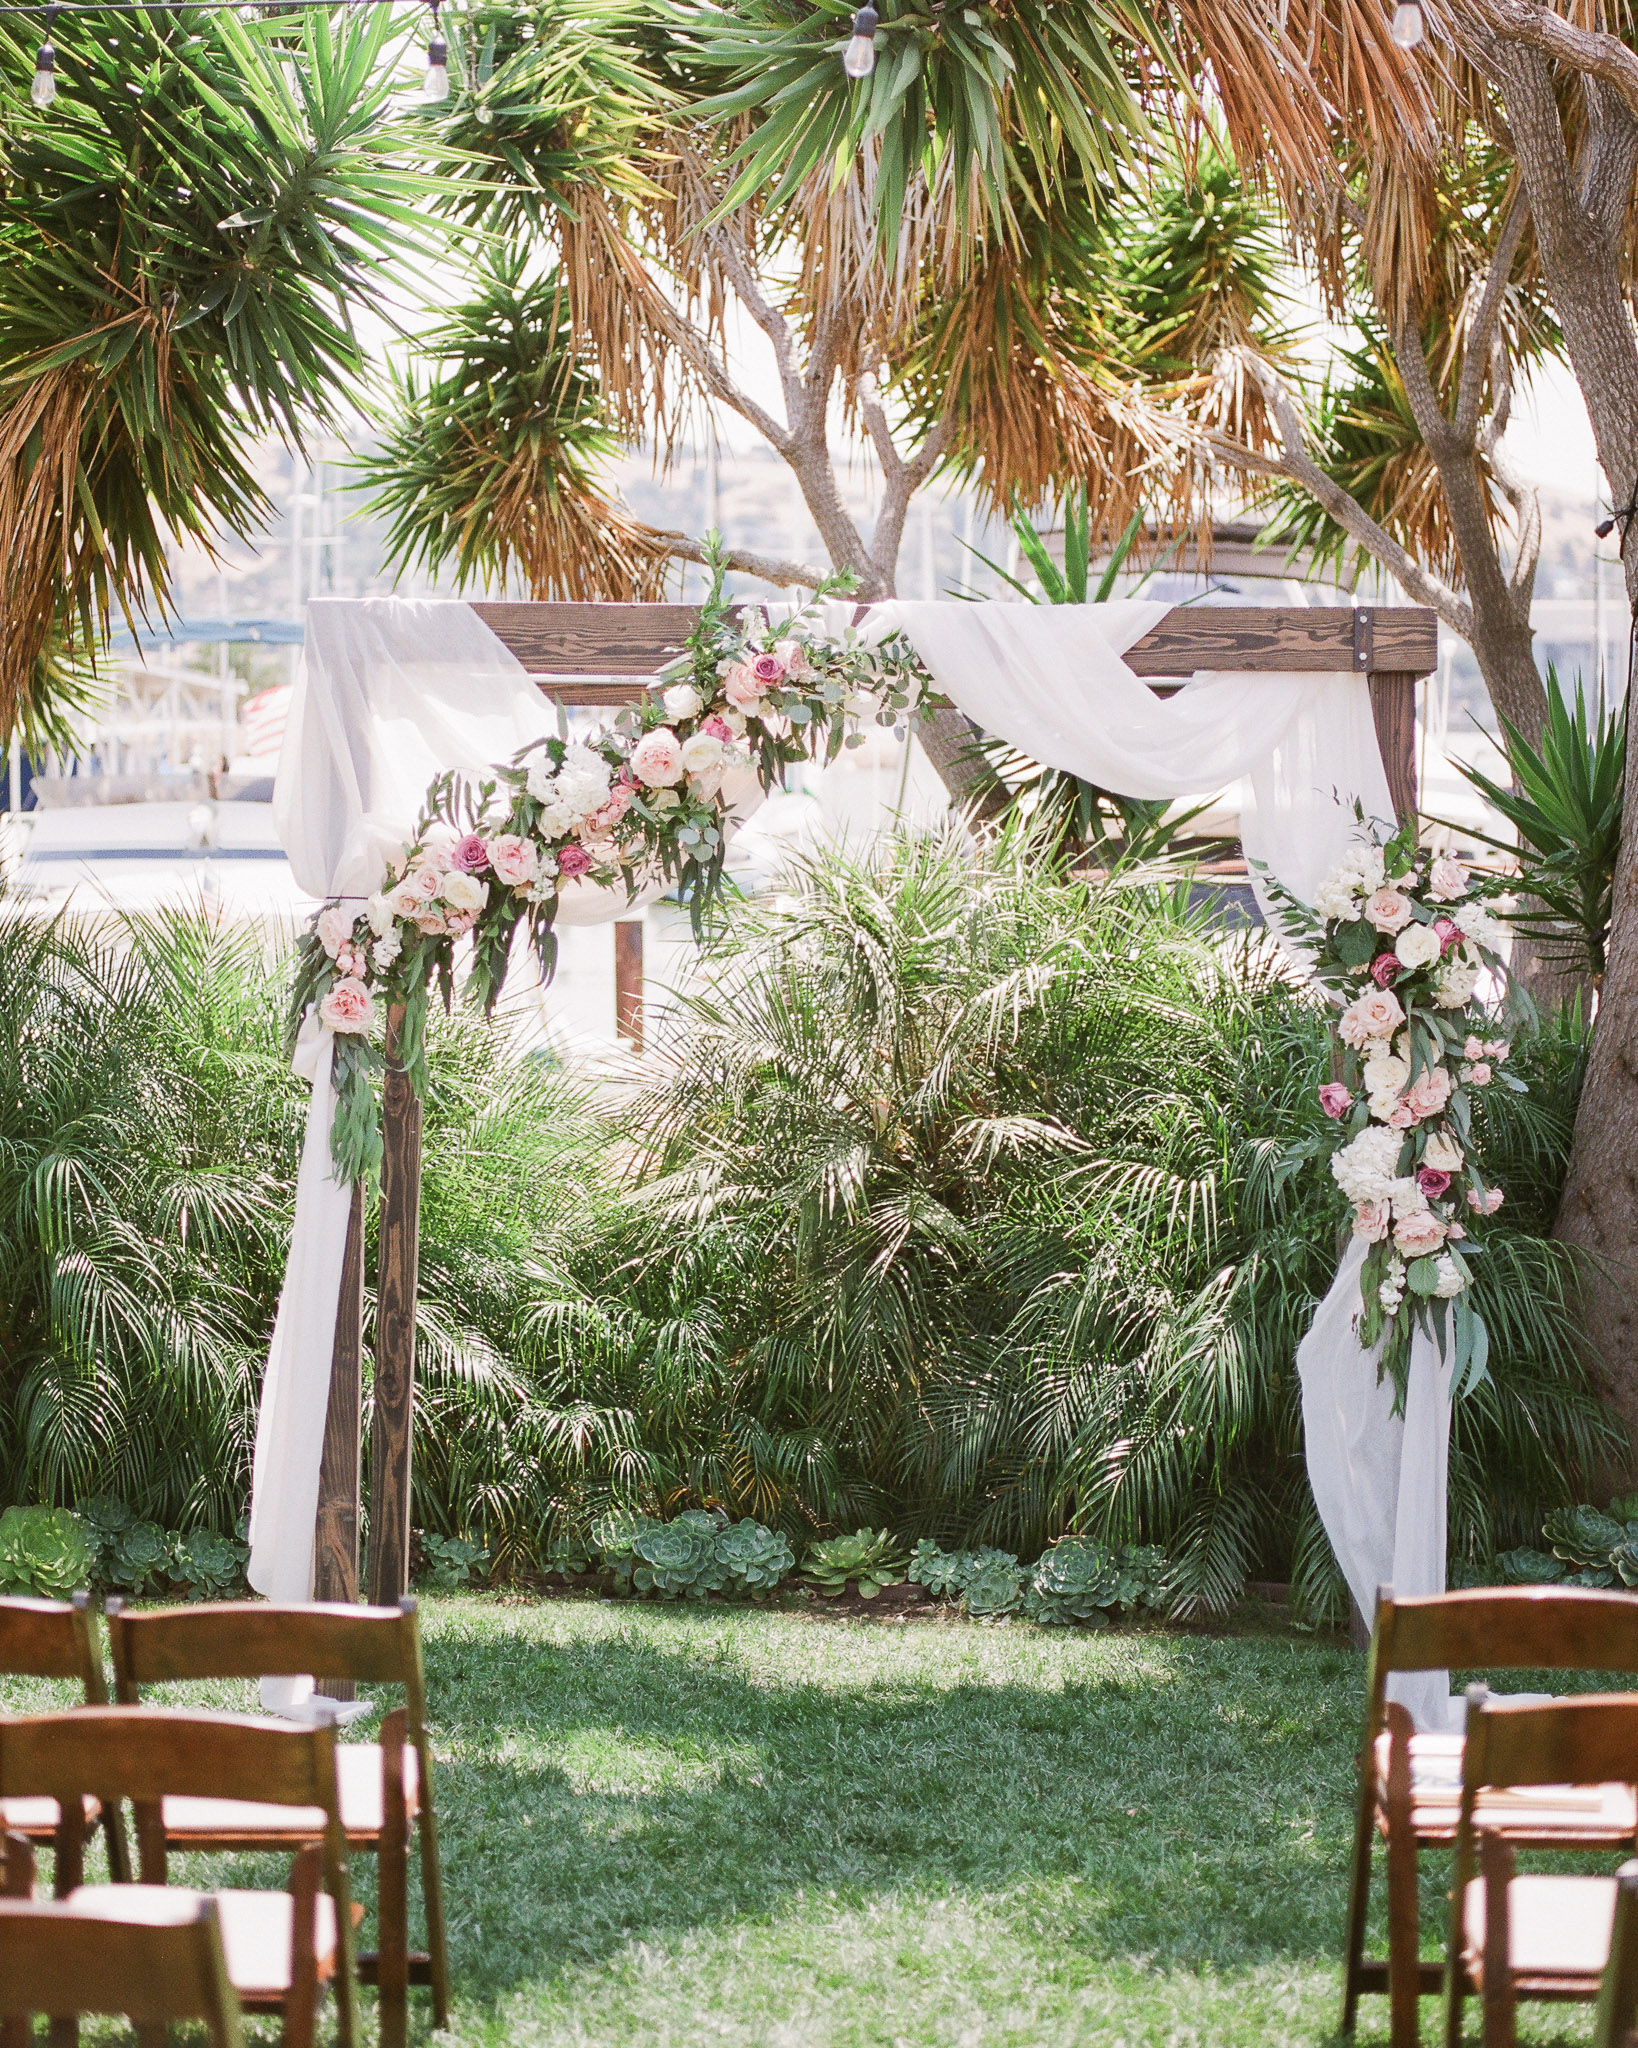 outdoor wedding ceremony custom wooden frame arch